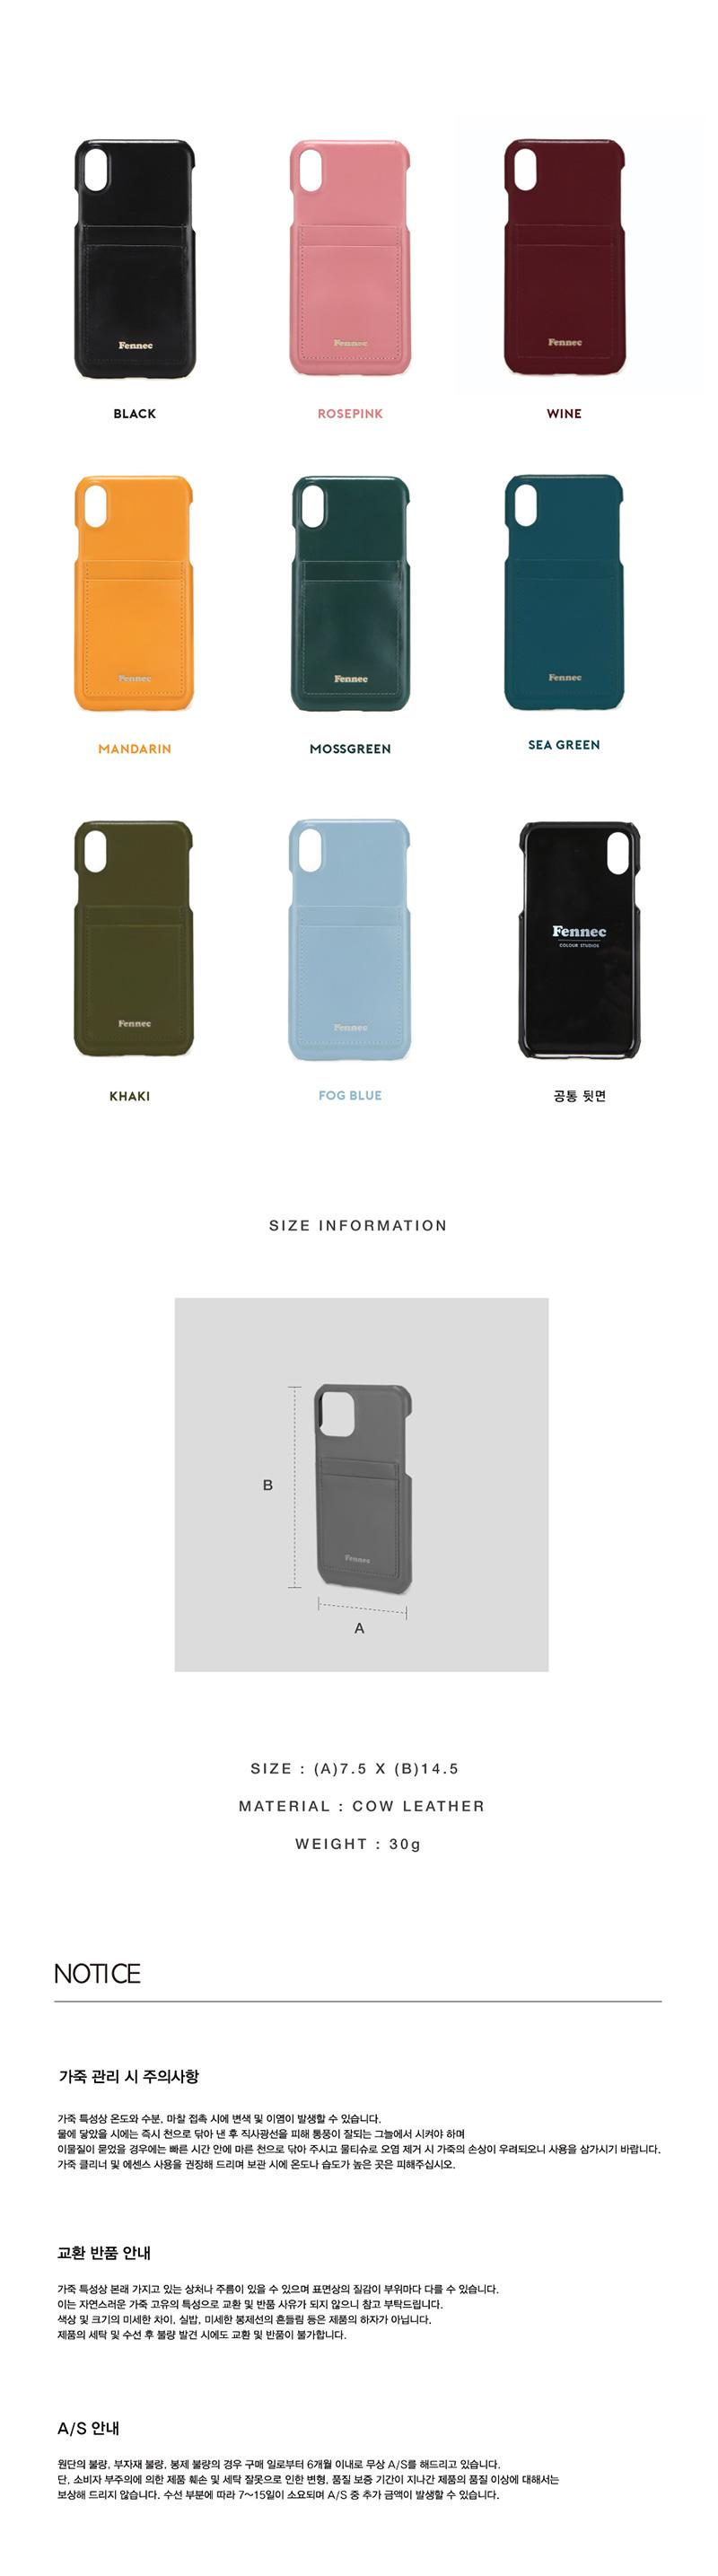 10x10-nu(all)-iphone-x,xs.jpg